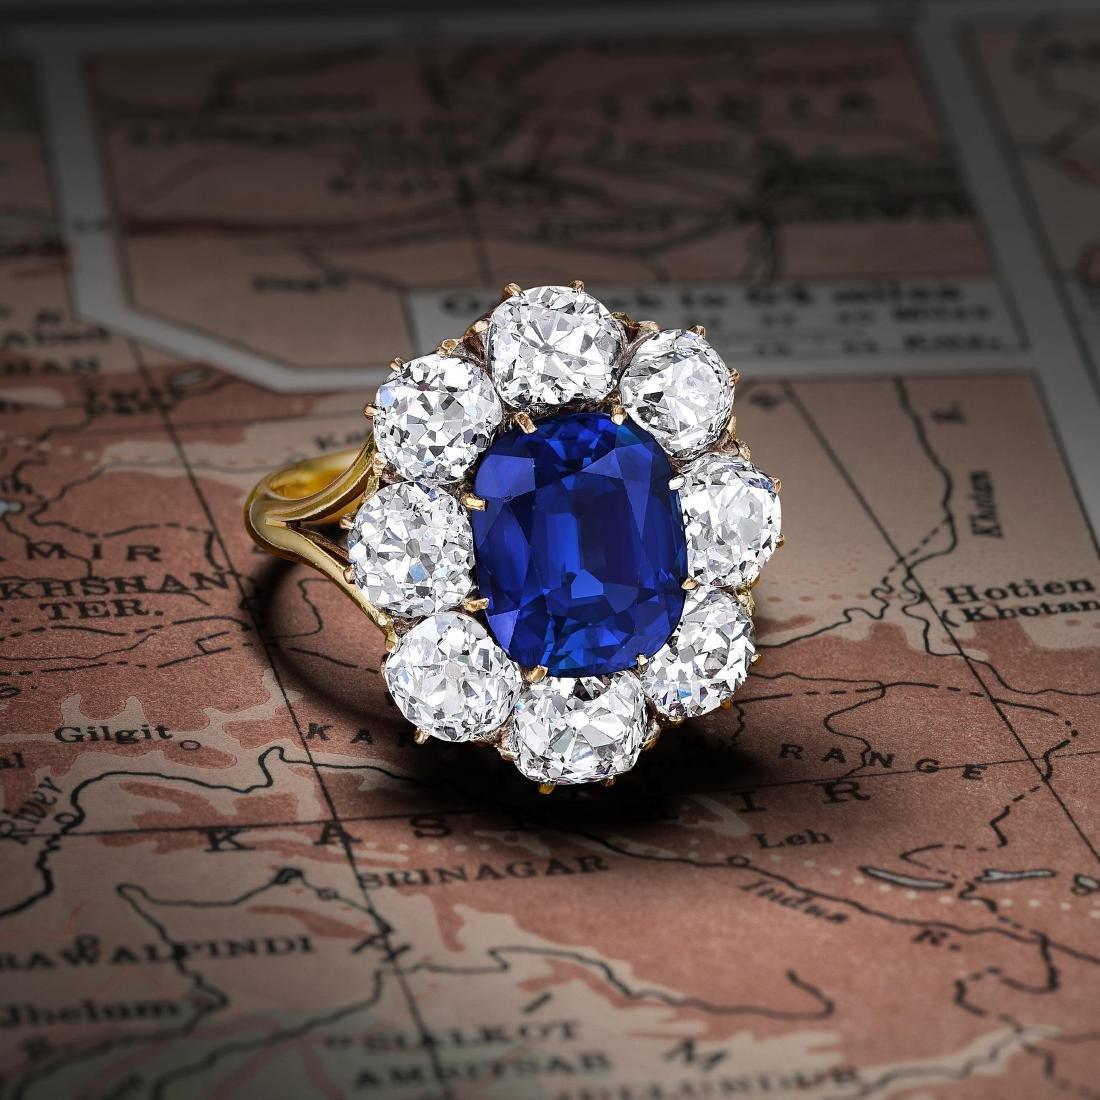 Victorian 4.30-Carat Kashmir Sapphire and Diamond Ring